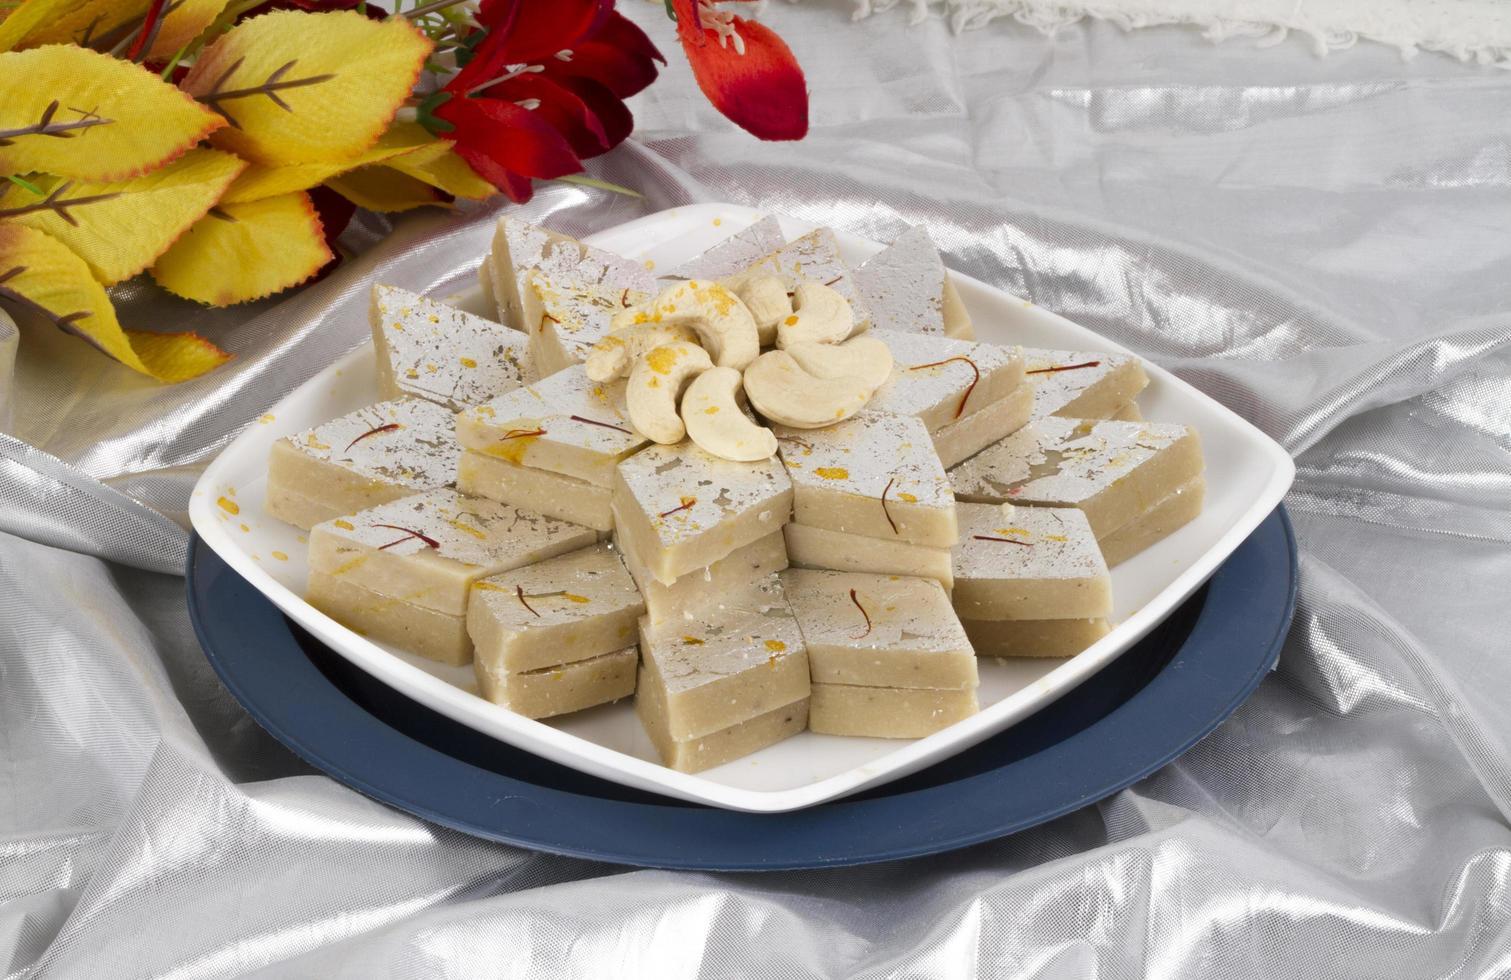 comida dulce tradicional especial india kaju katli foto